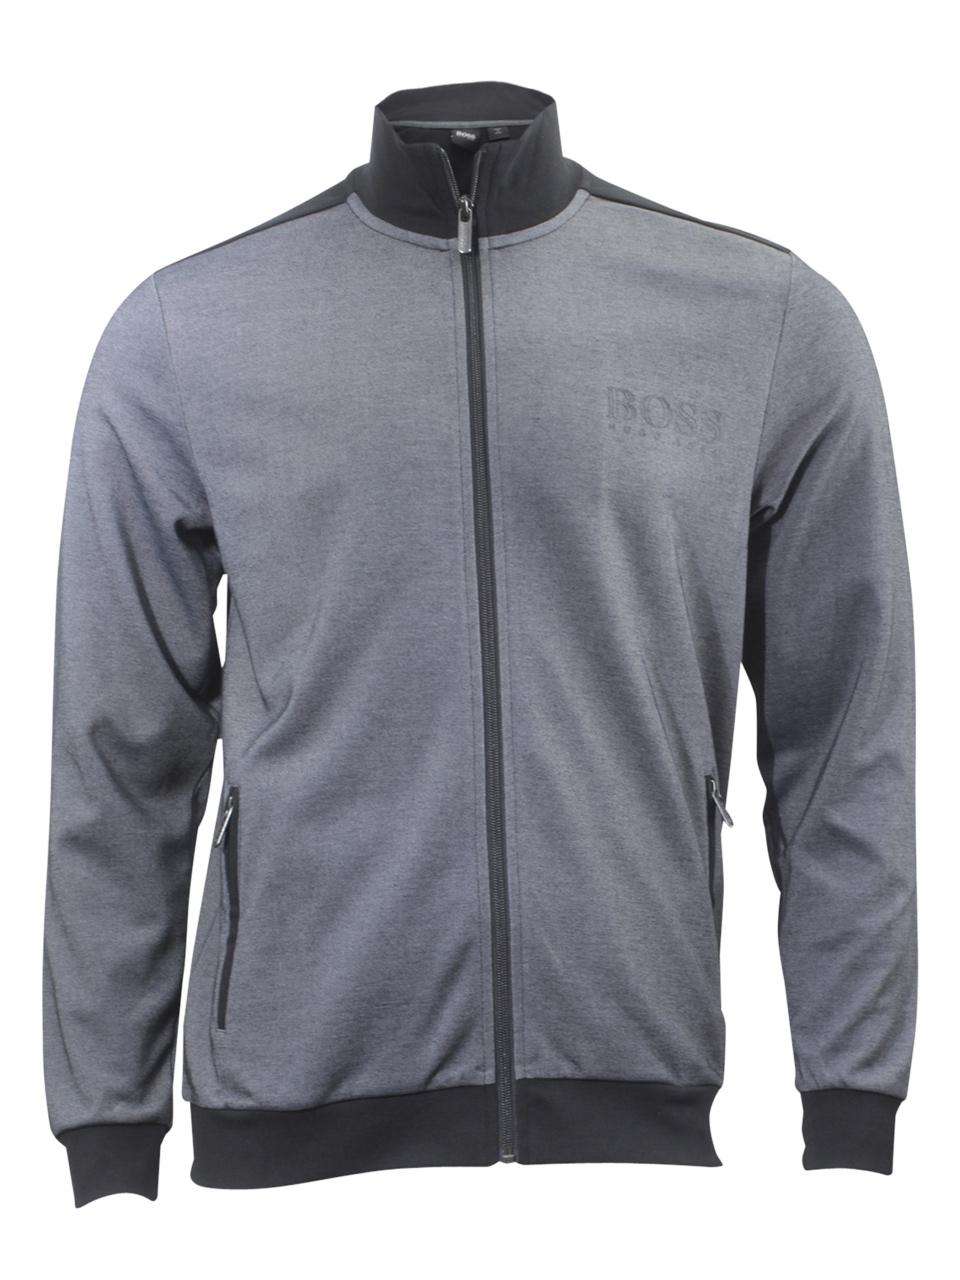 Hugo Boss Men's Bicolored Black Pique Tracksuit Jacket Sz: S